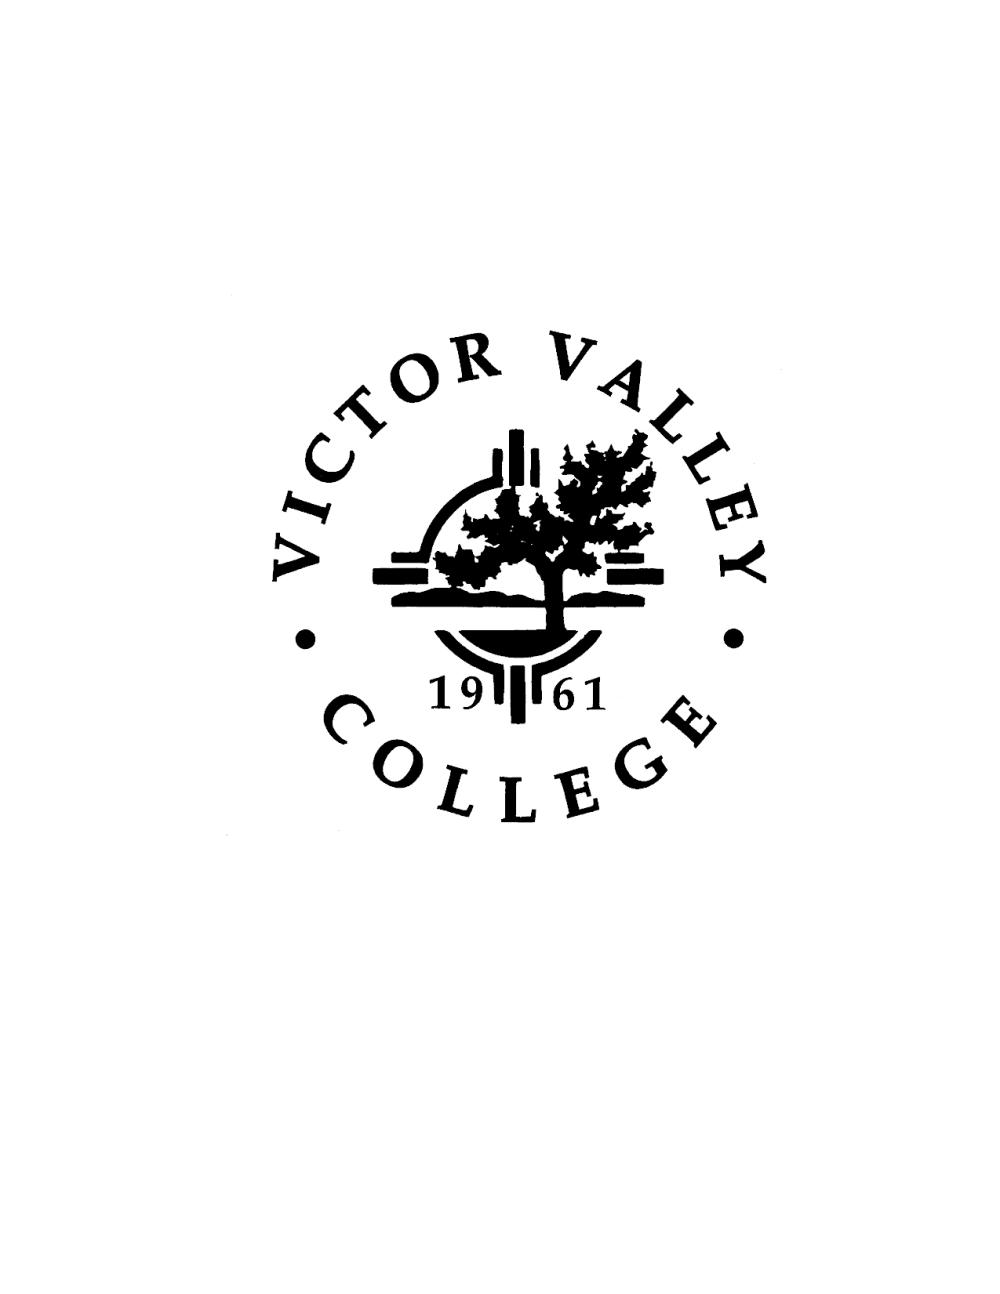 medium resolution of 2007-2008 Victor Valley College Catalog 1